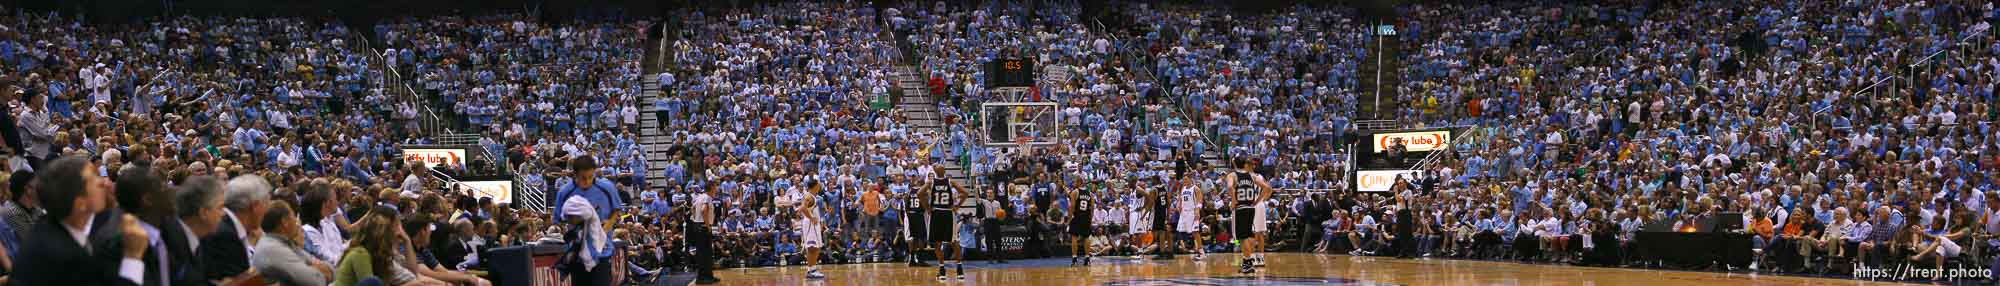 Salt Lake City - Utah Jazz vs. San Antonio Spurs, Western Conference Finals game four at EnergySolutions Arena. 5.28.2007